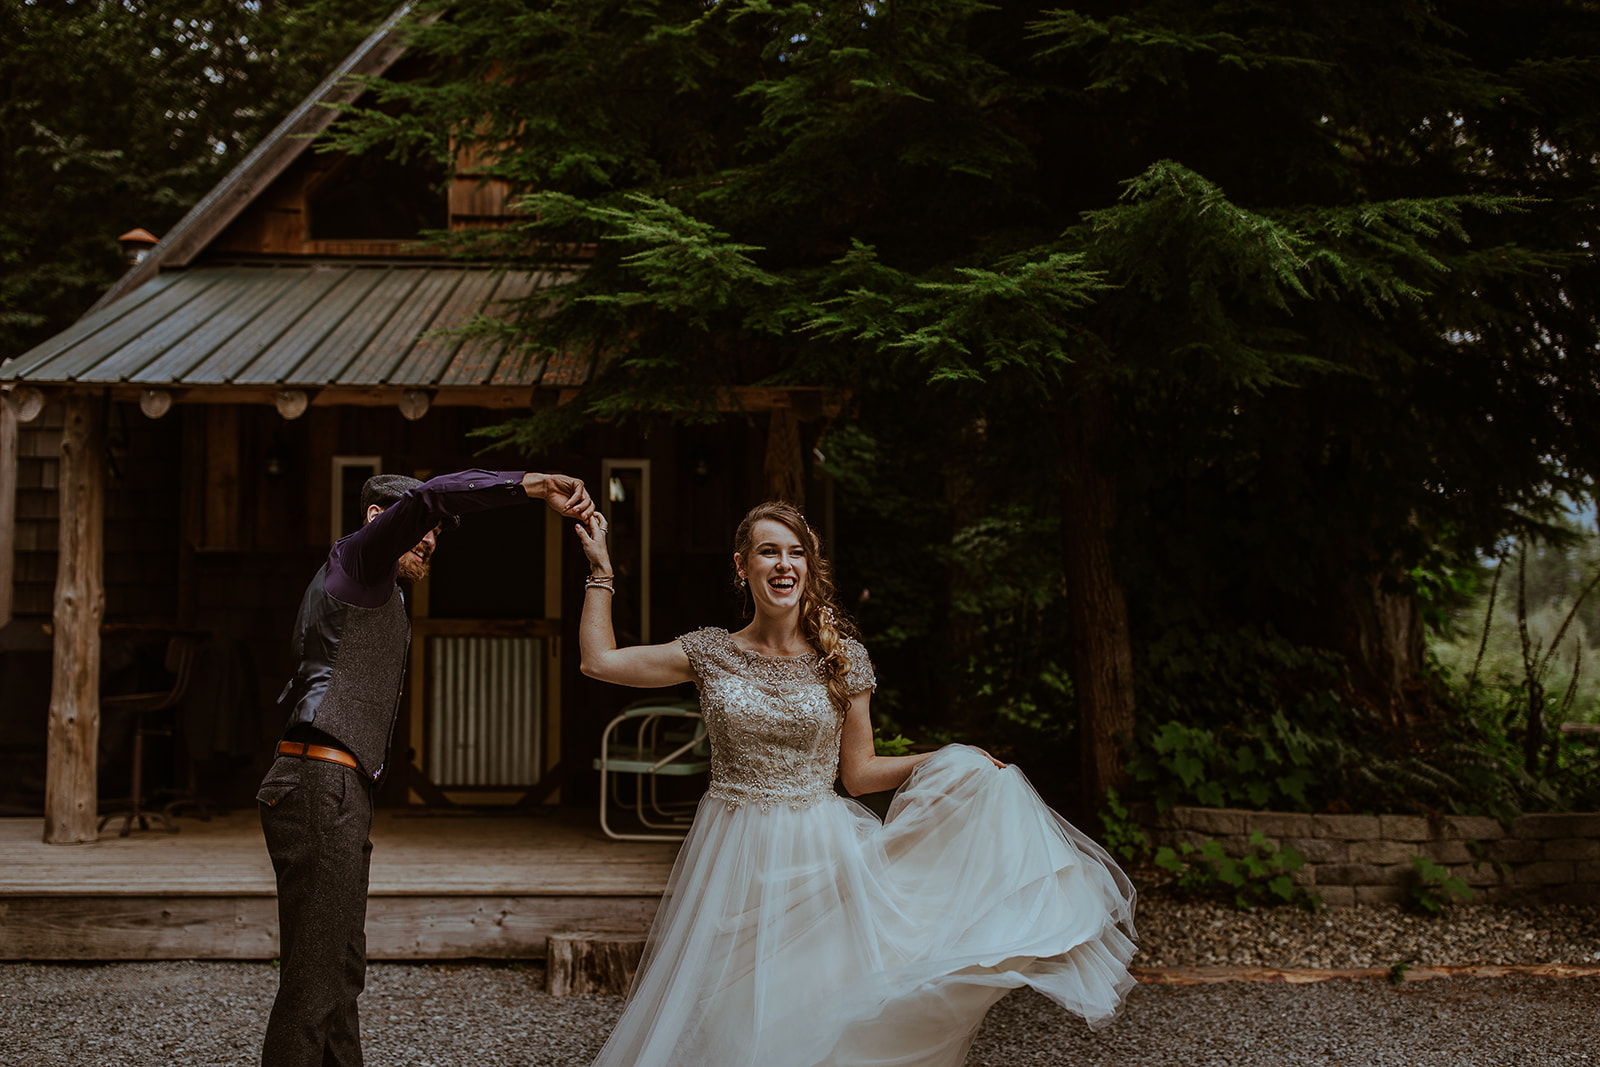 mount-rainier-cabin-elopement-megan-gallagher-photography_(143_of_568).jpg